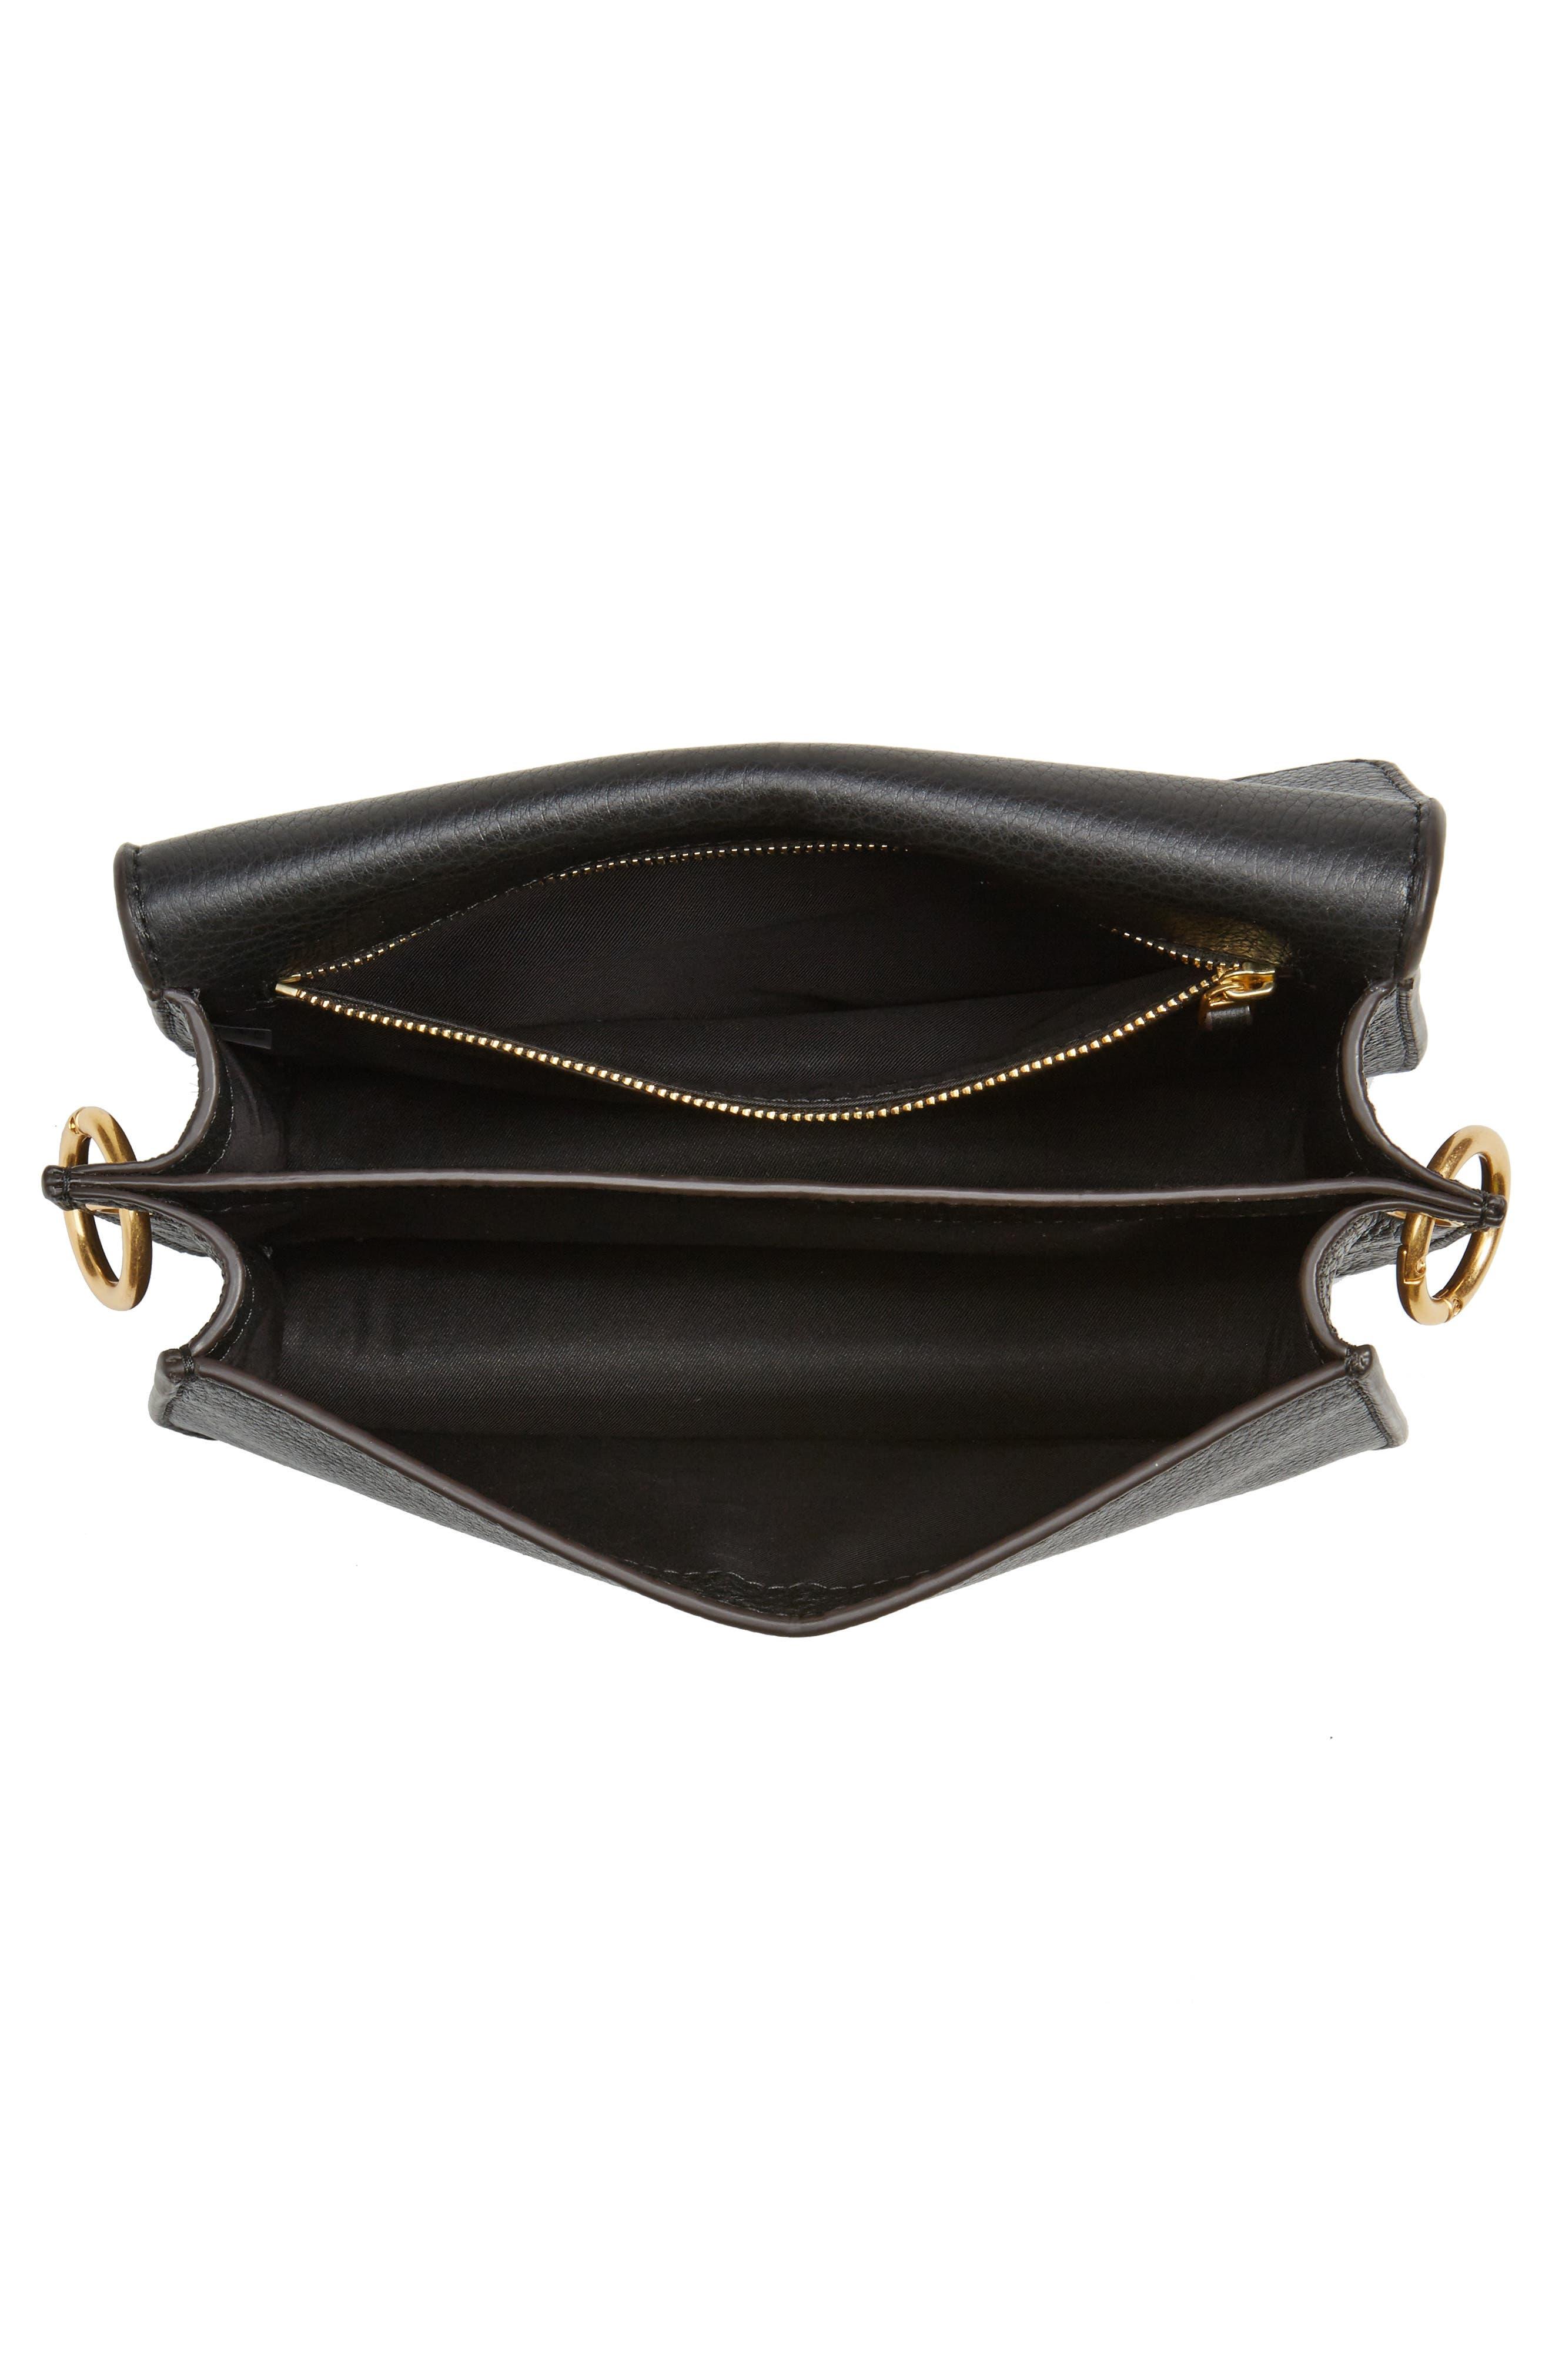 McGraw Leather Shoulder Bag,                             Alternate thumbnail 4, color,                             001